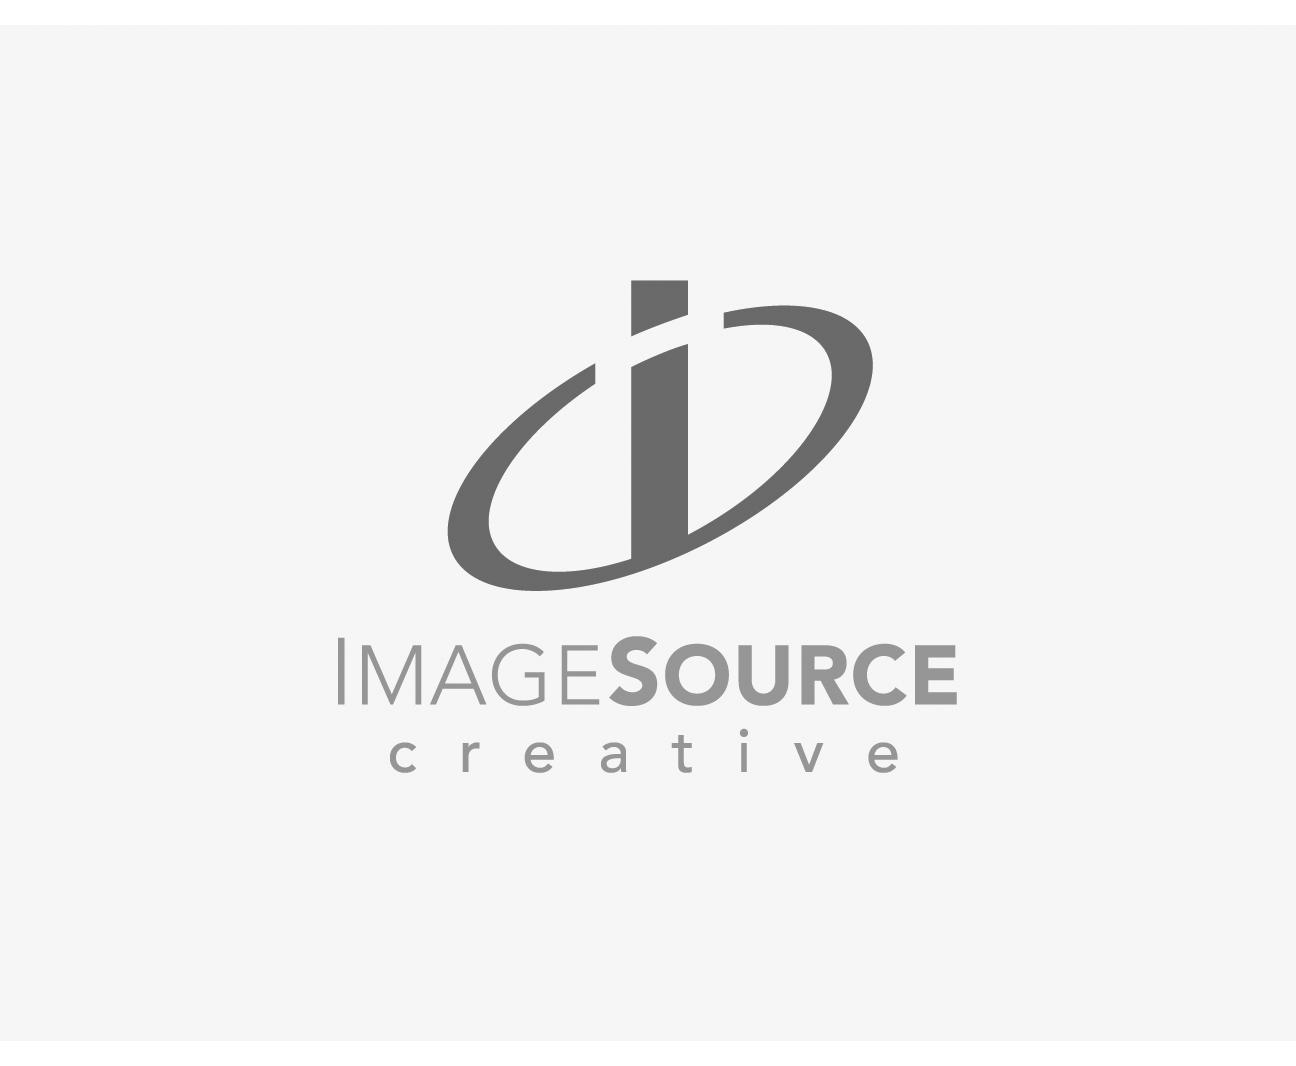 logo_imagesourc_gs.jpg